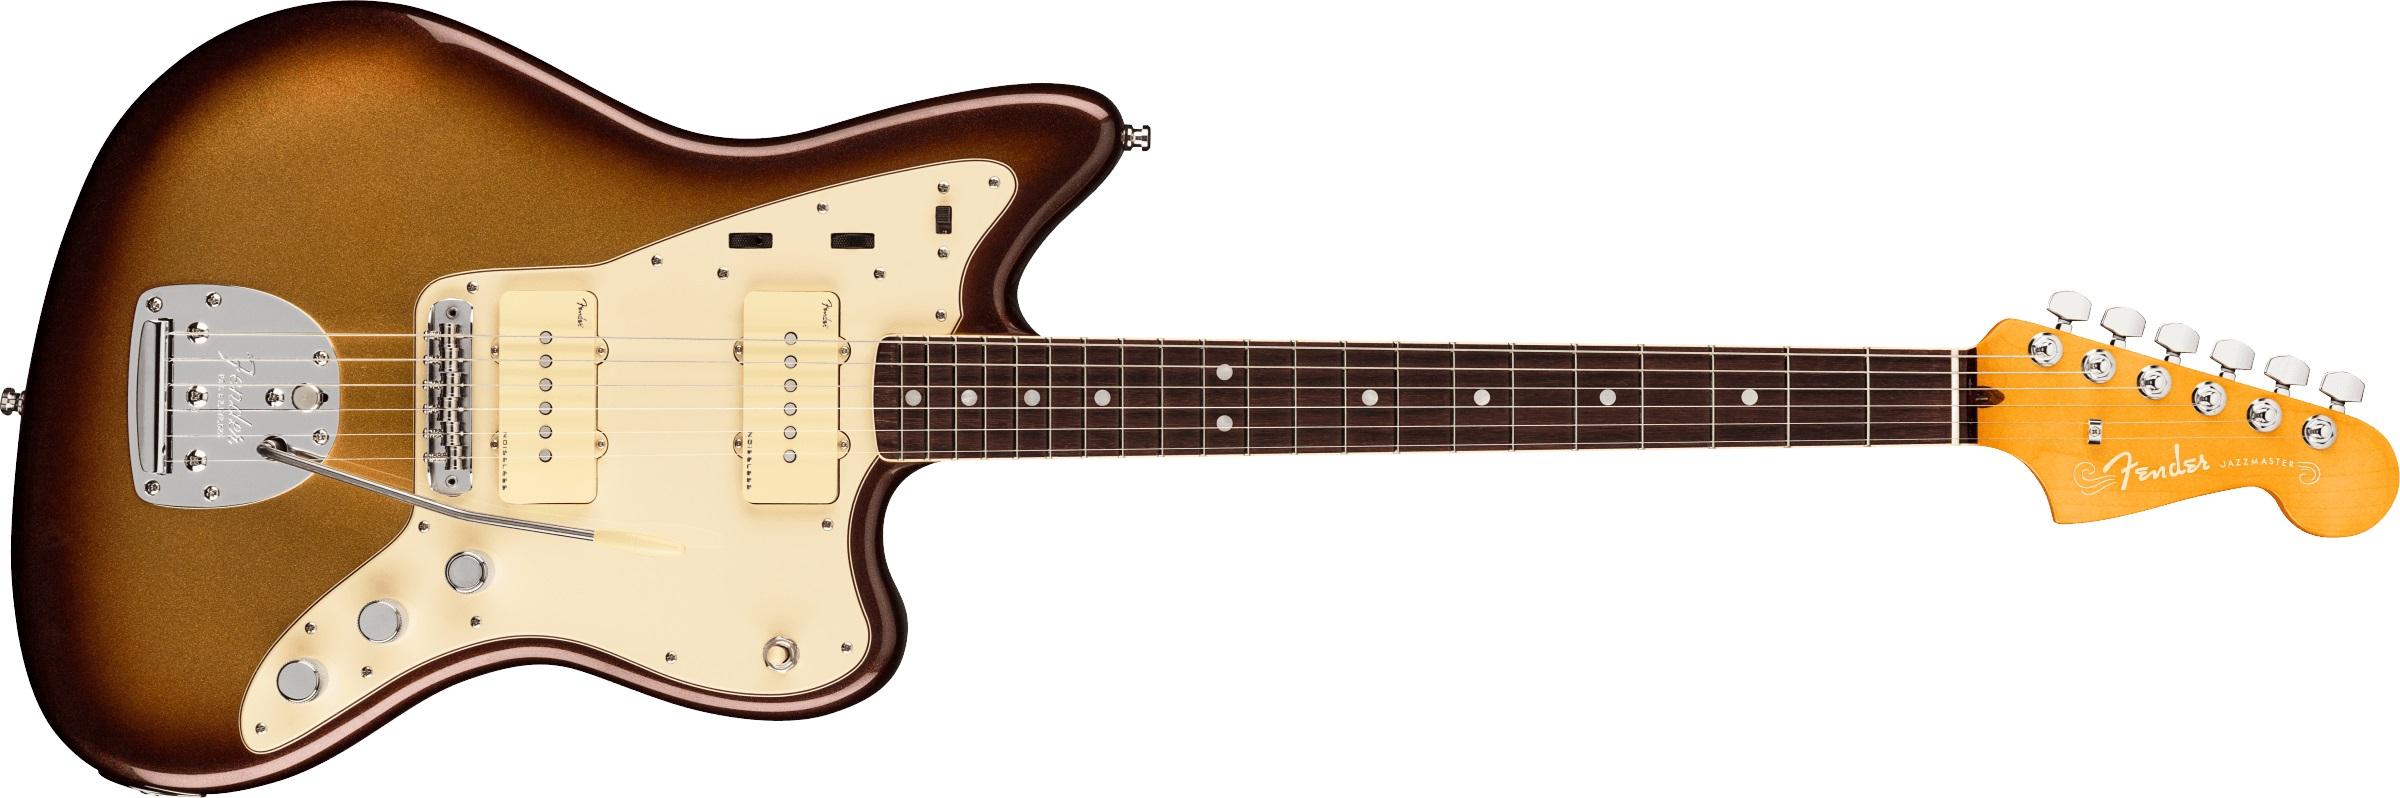 Fender American Ultra Jazzmaster RW MB